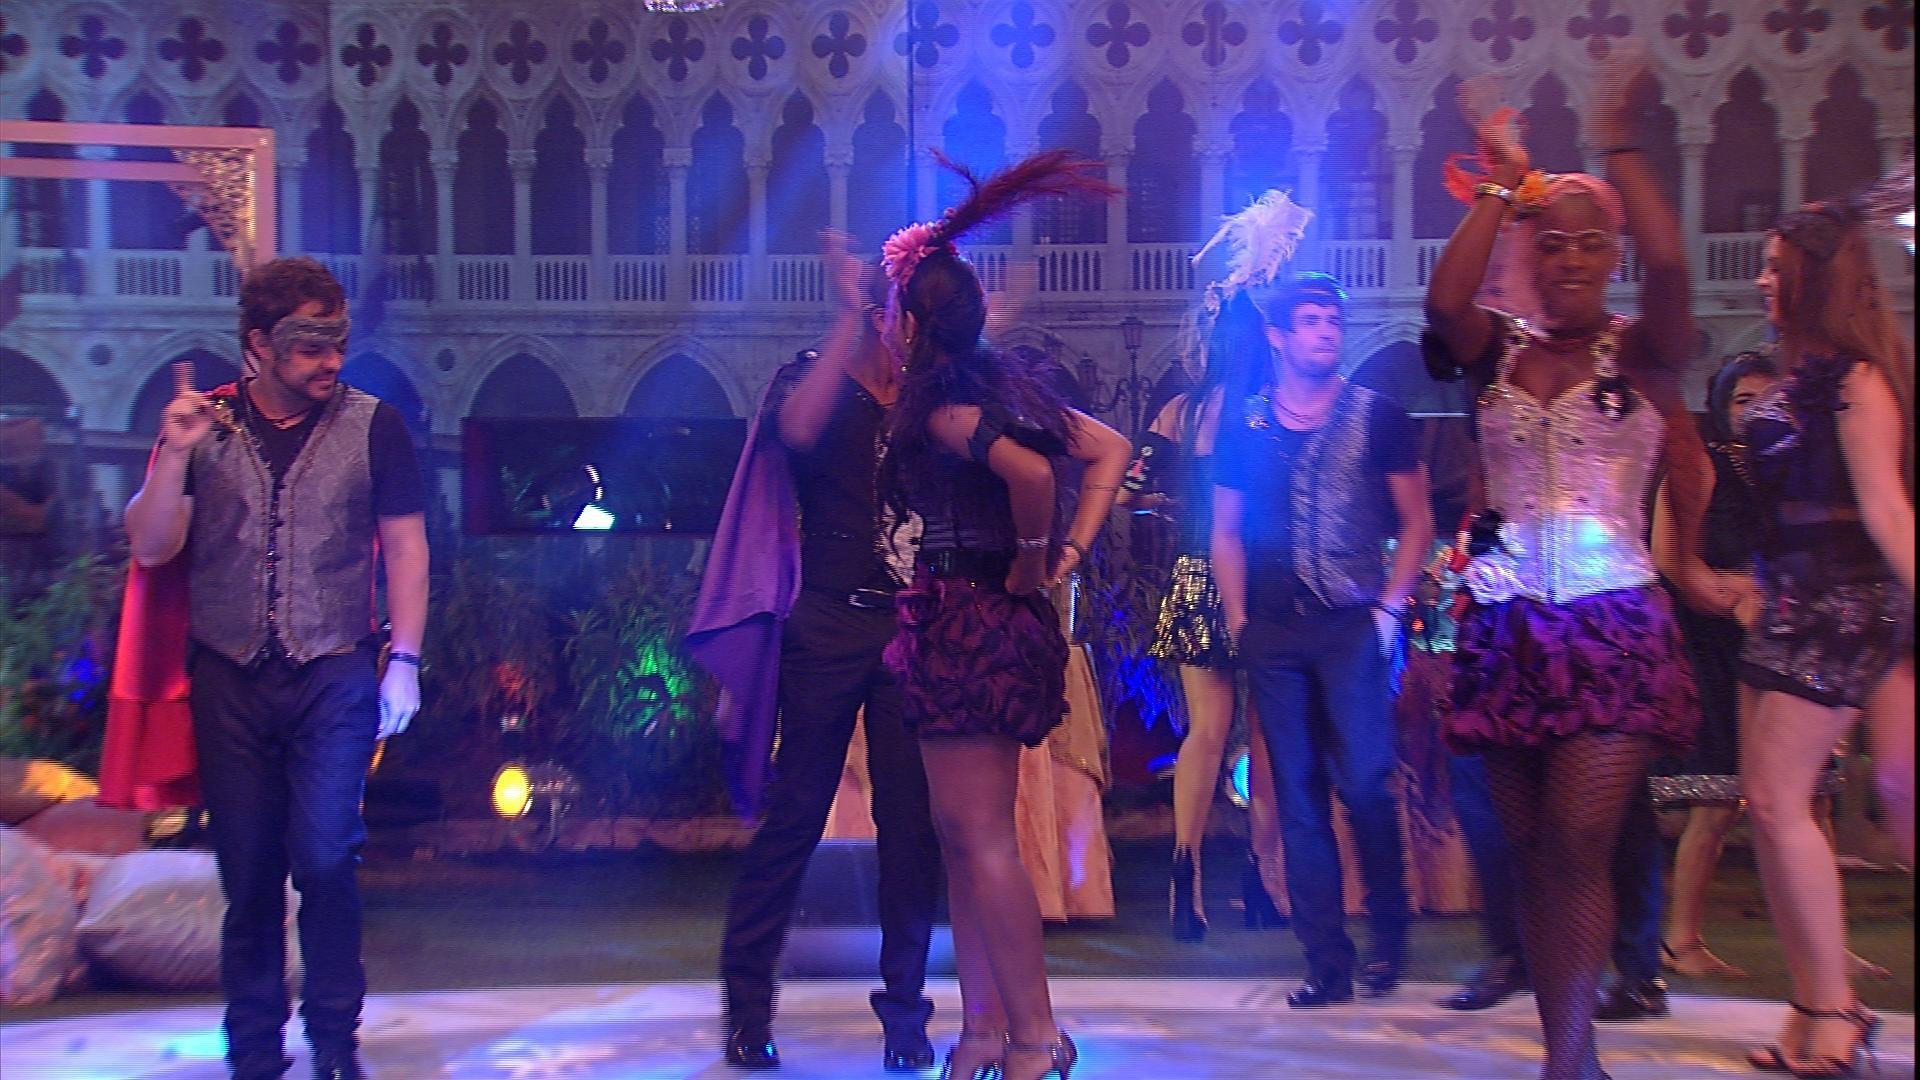 Dia de festa! Brothers se divertem no Baile em Veneza